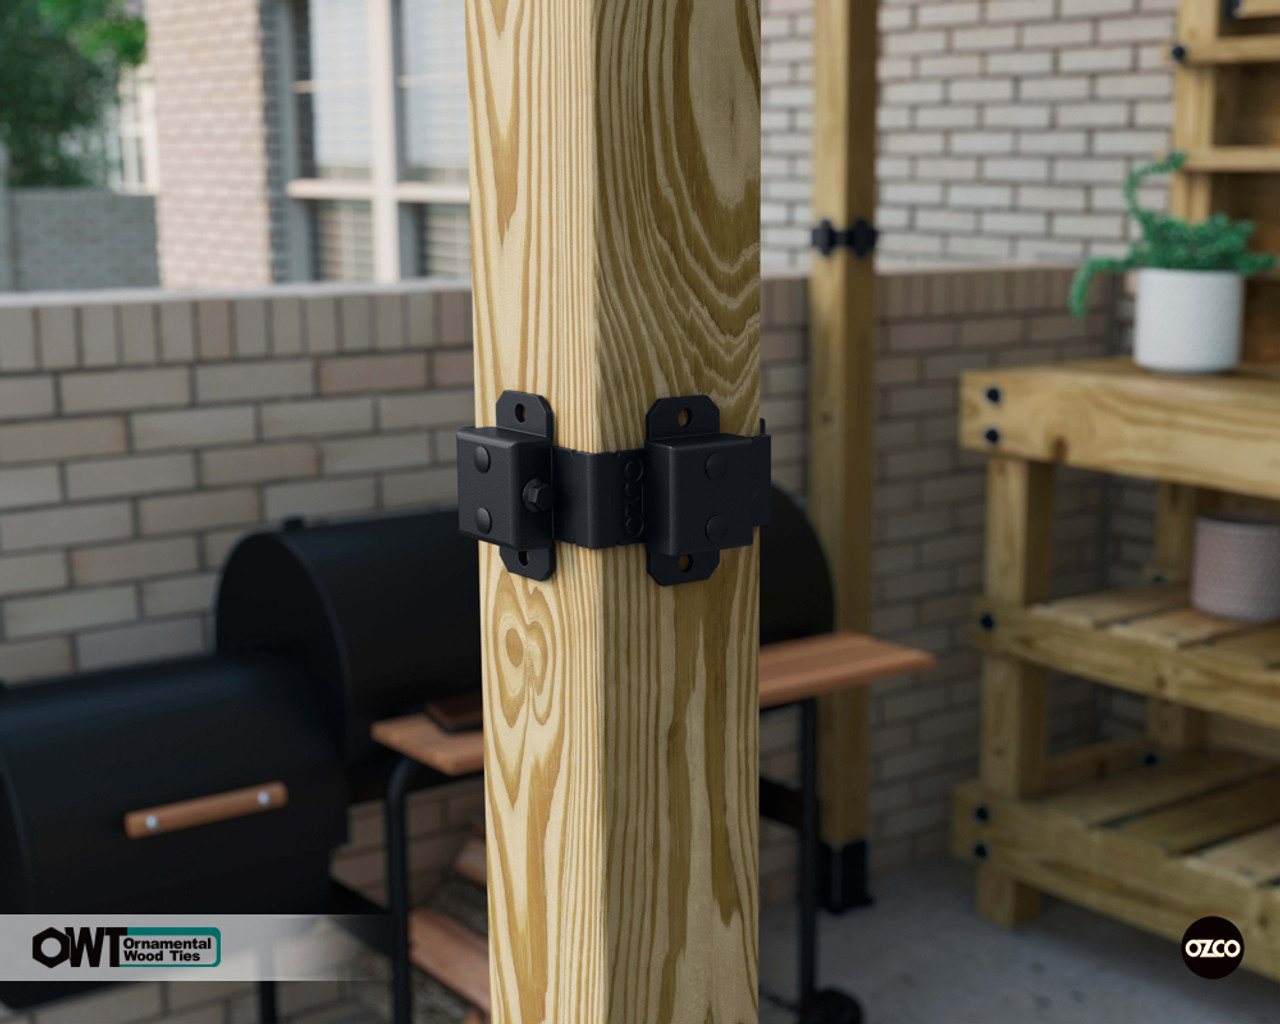 OZCO Ornamental Wood Ties Post Band Installed on 4x4 Post